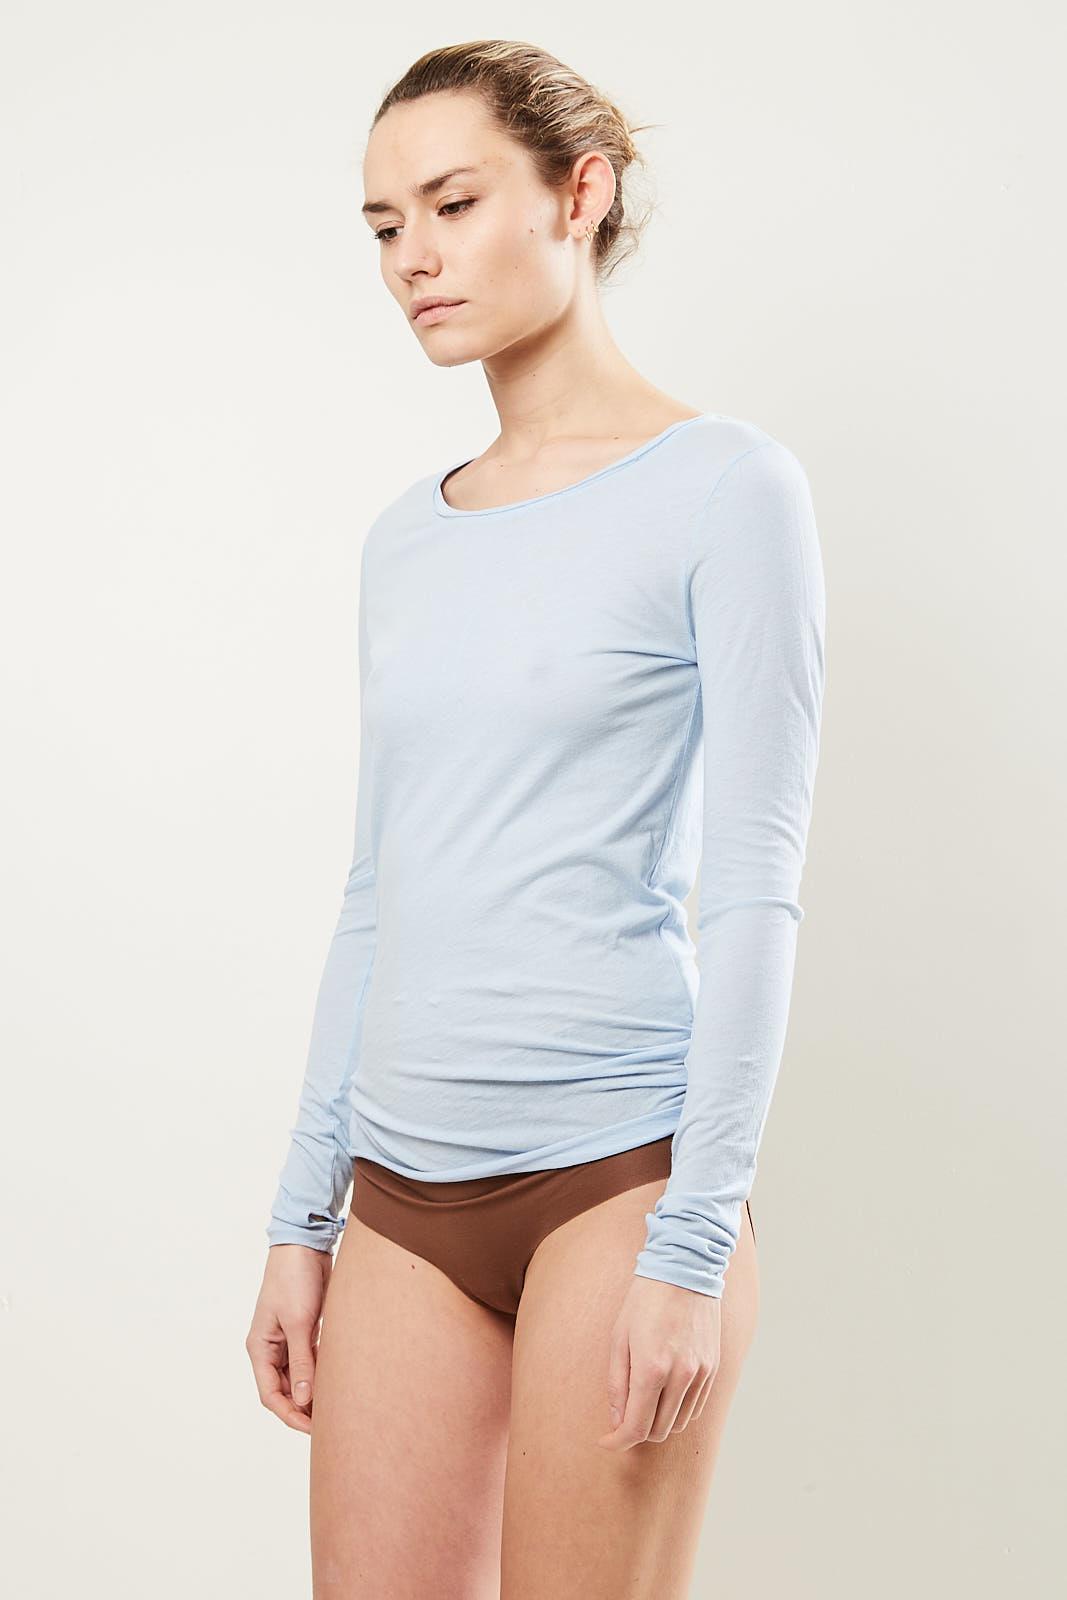 Humanoid - Janes jersey bio tees cloud